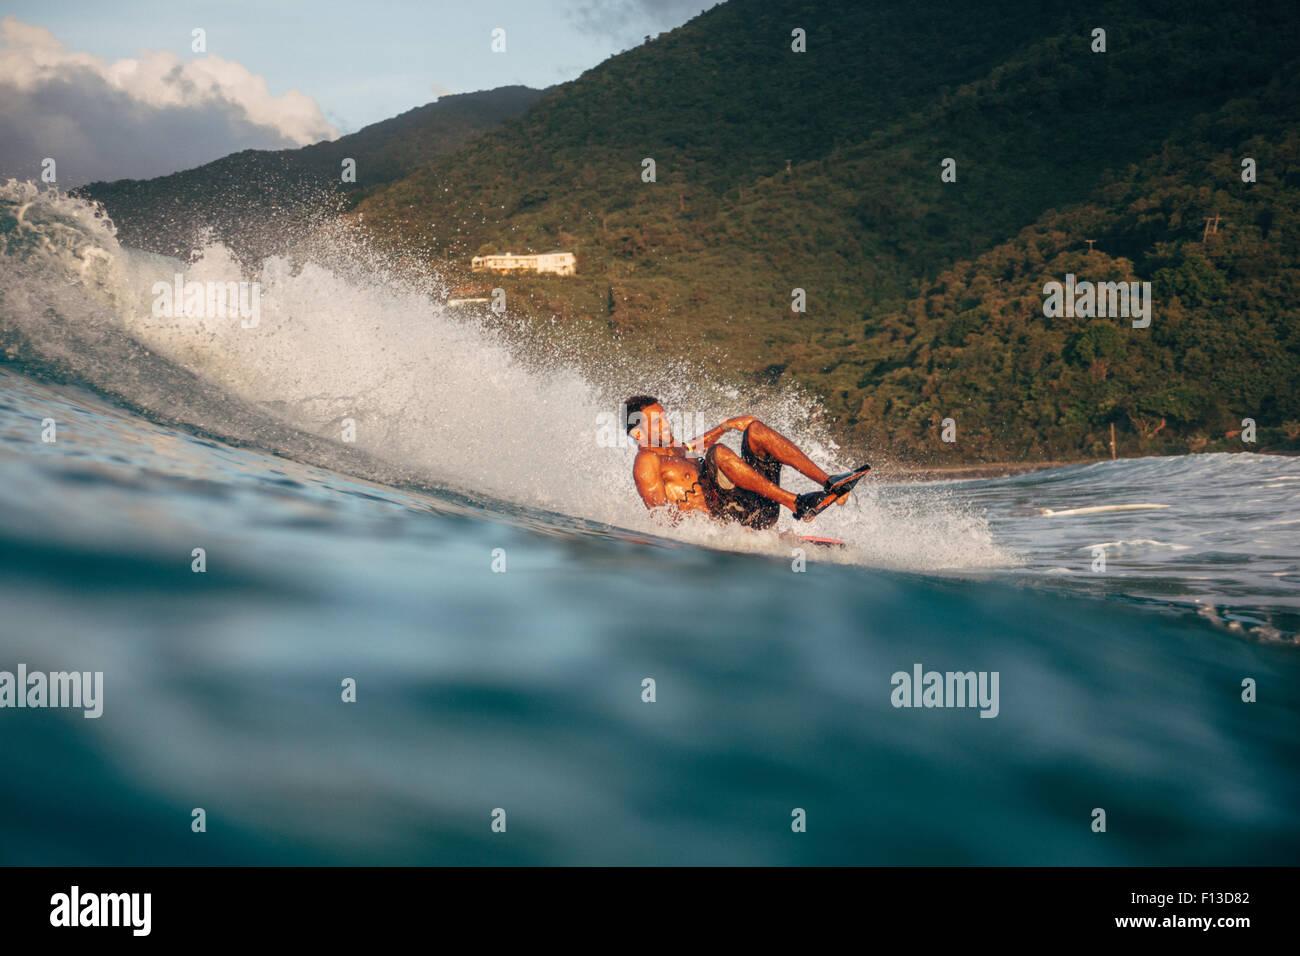 Man bodyboarding in the Caribbean - Stock Image